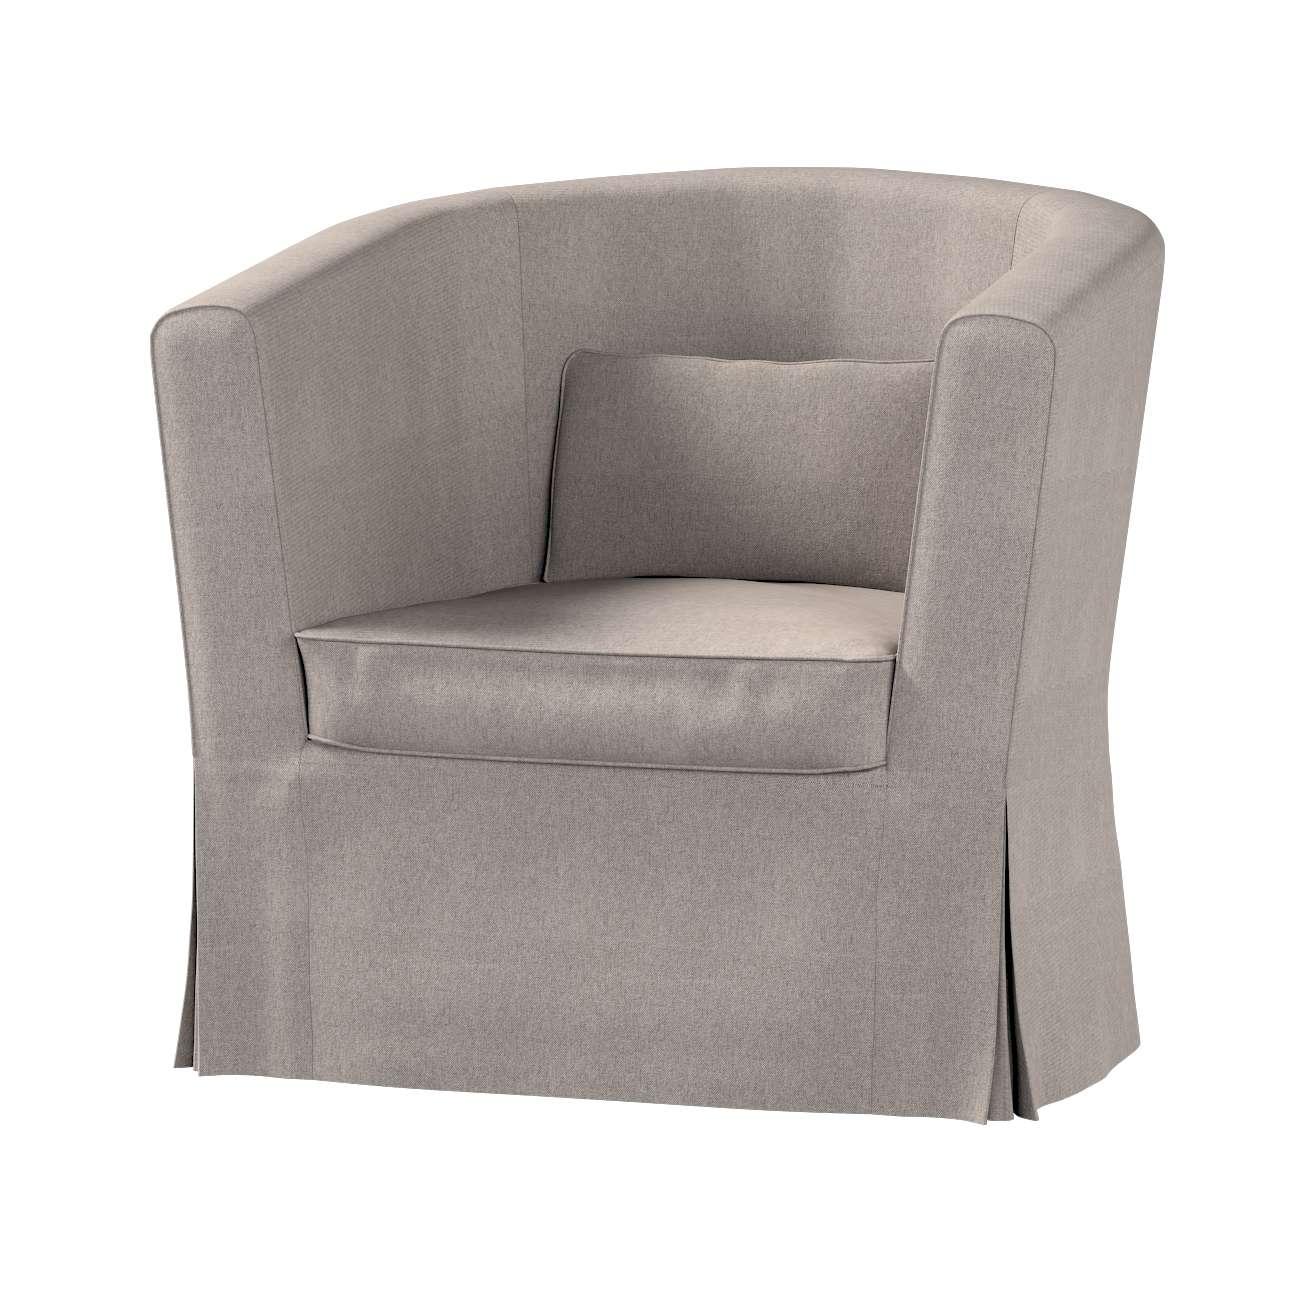 Pokrowiec na fotel Ektorp Tullsta fotel Ektorp Tullsta w kolekcji Etna , tkanina: 705-09